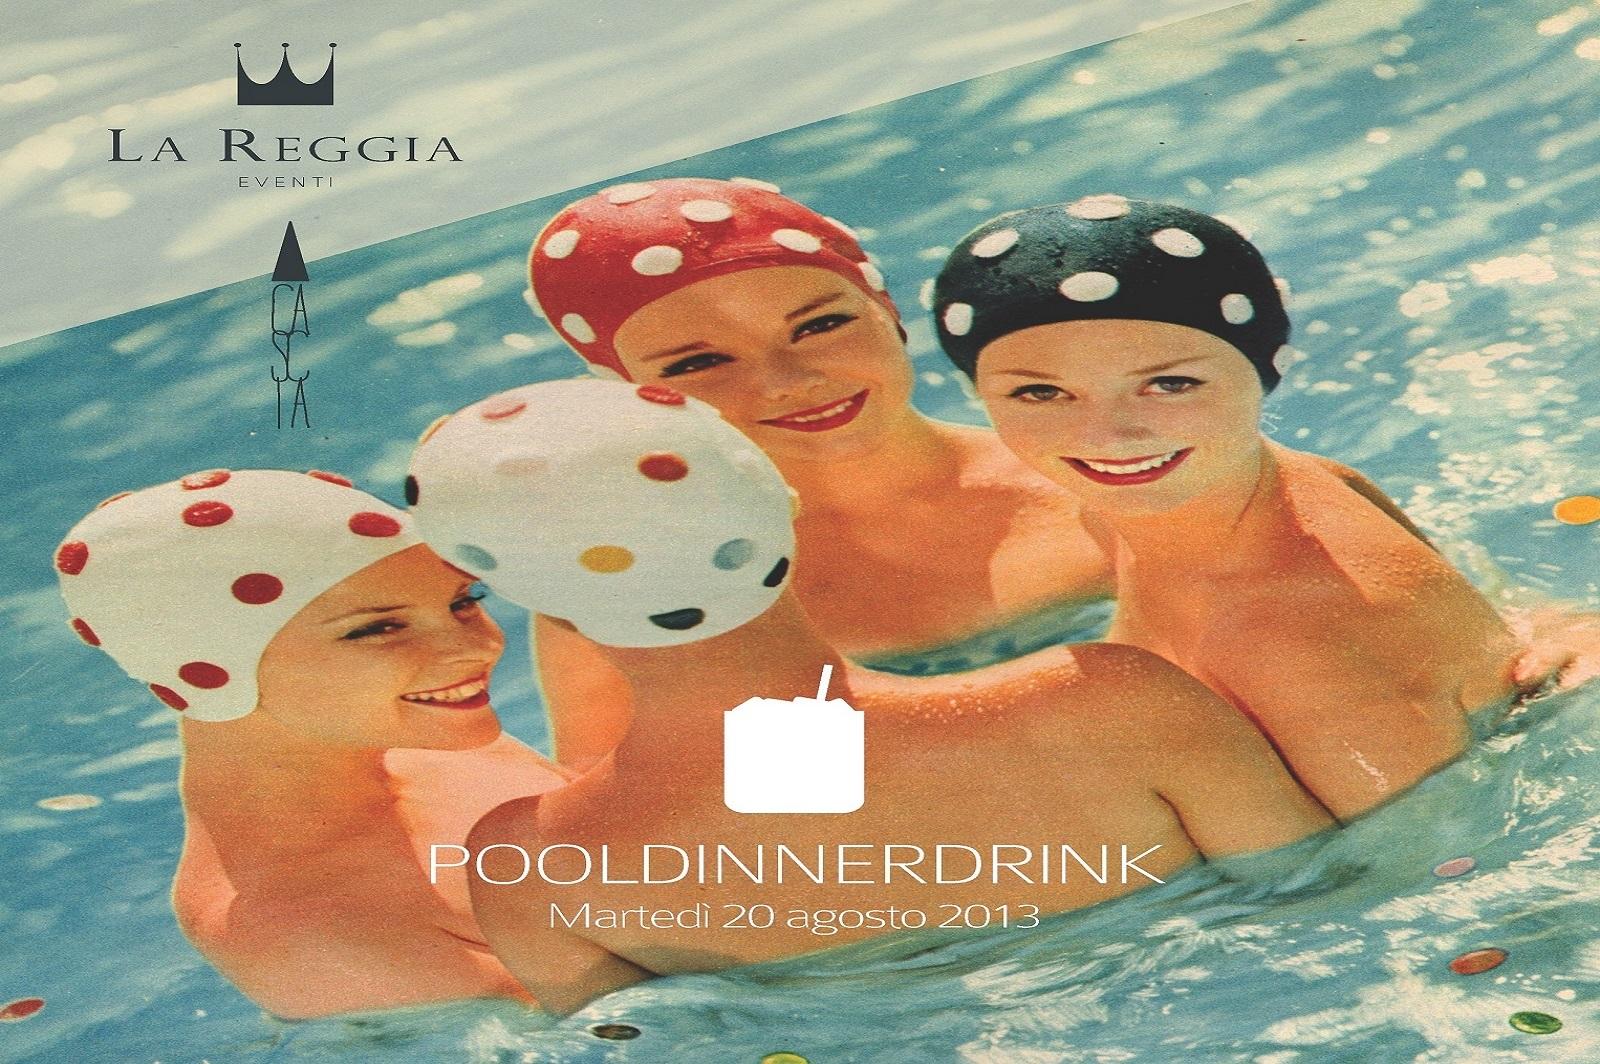 Pool dinner drink party festa cascia